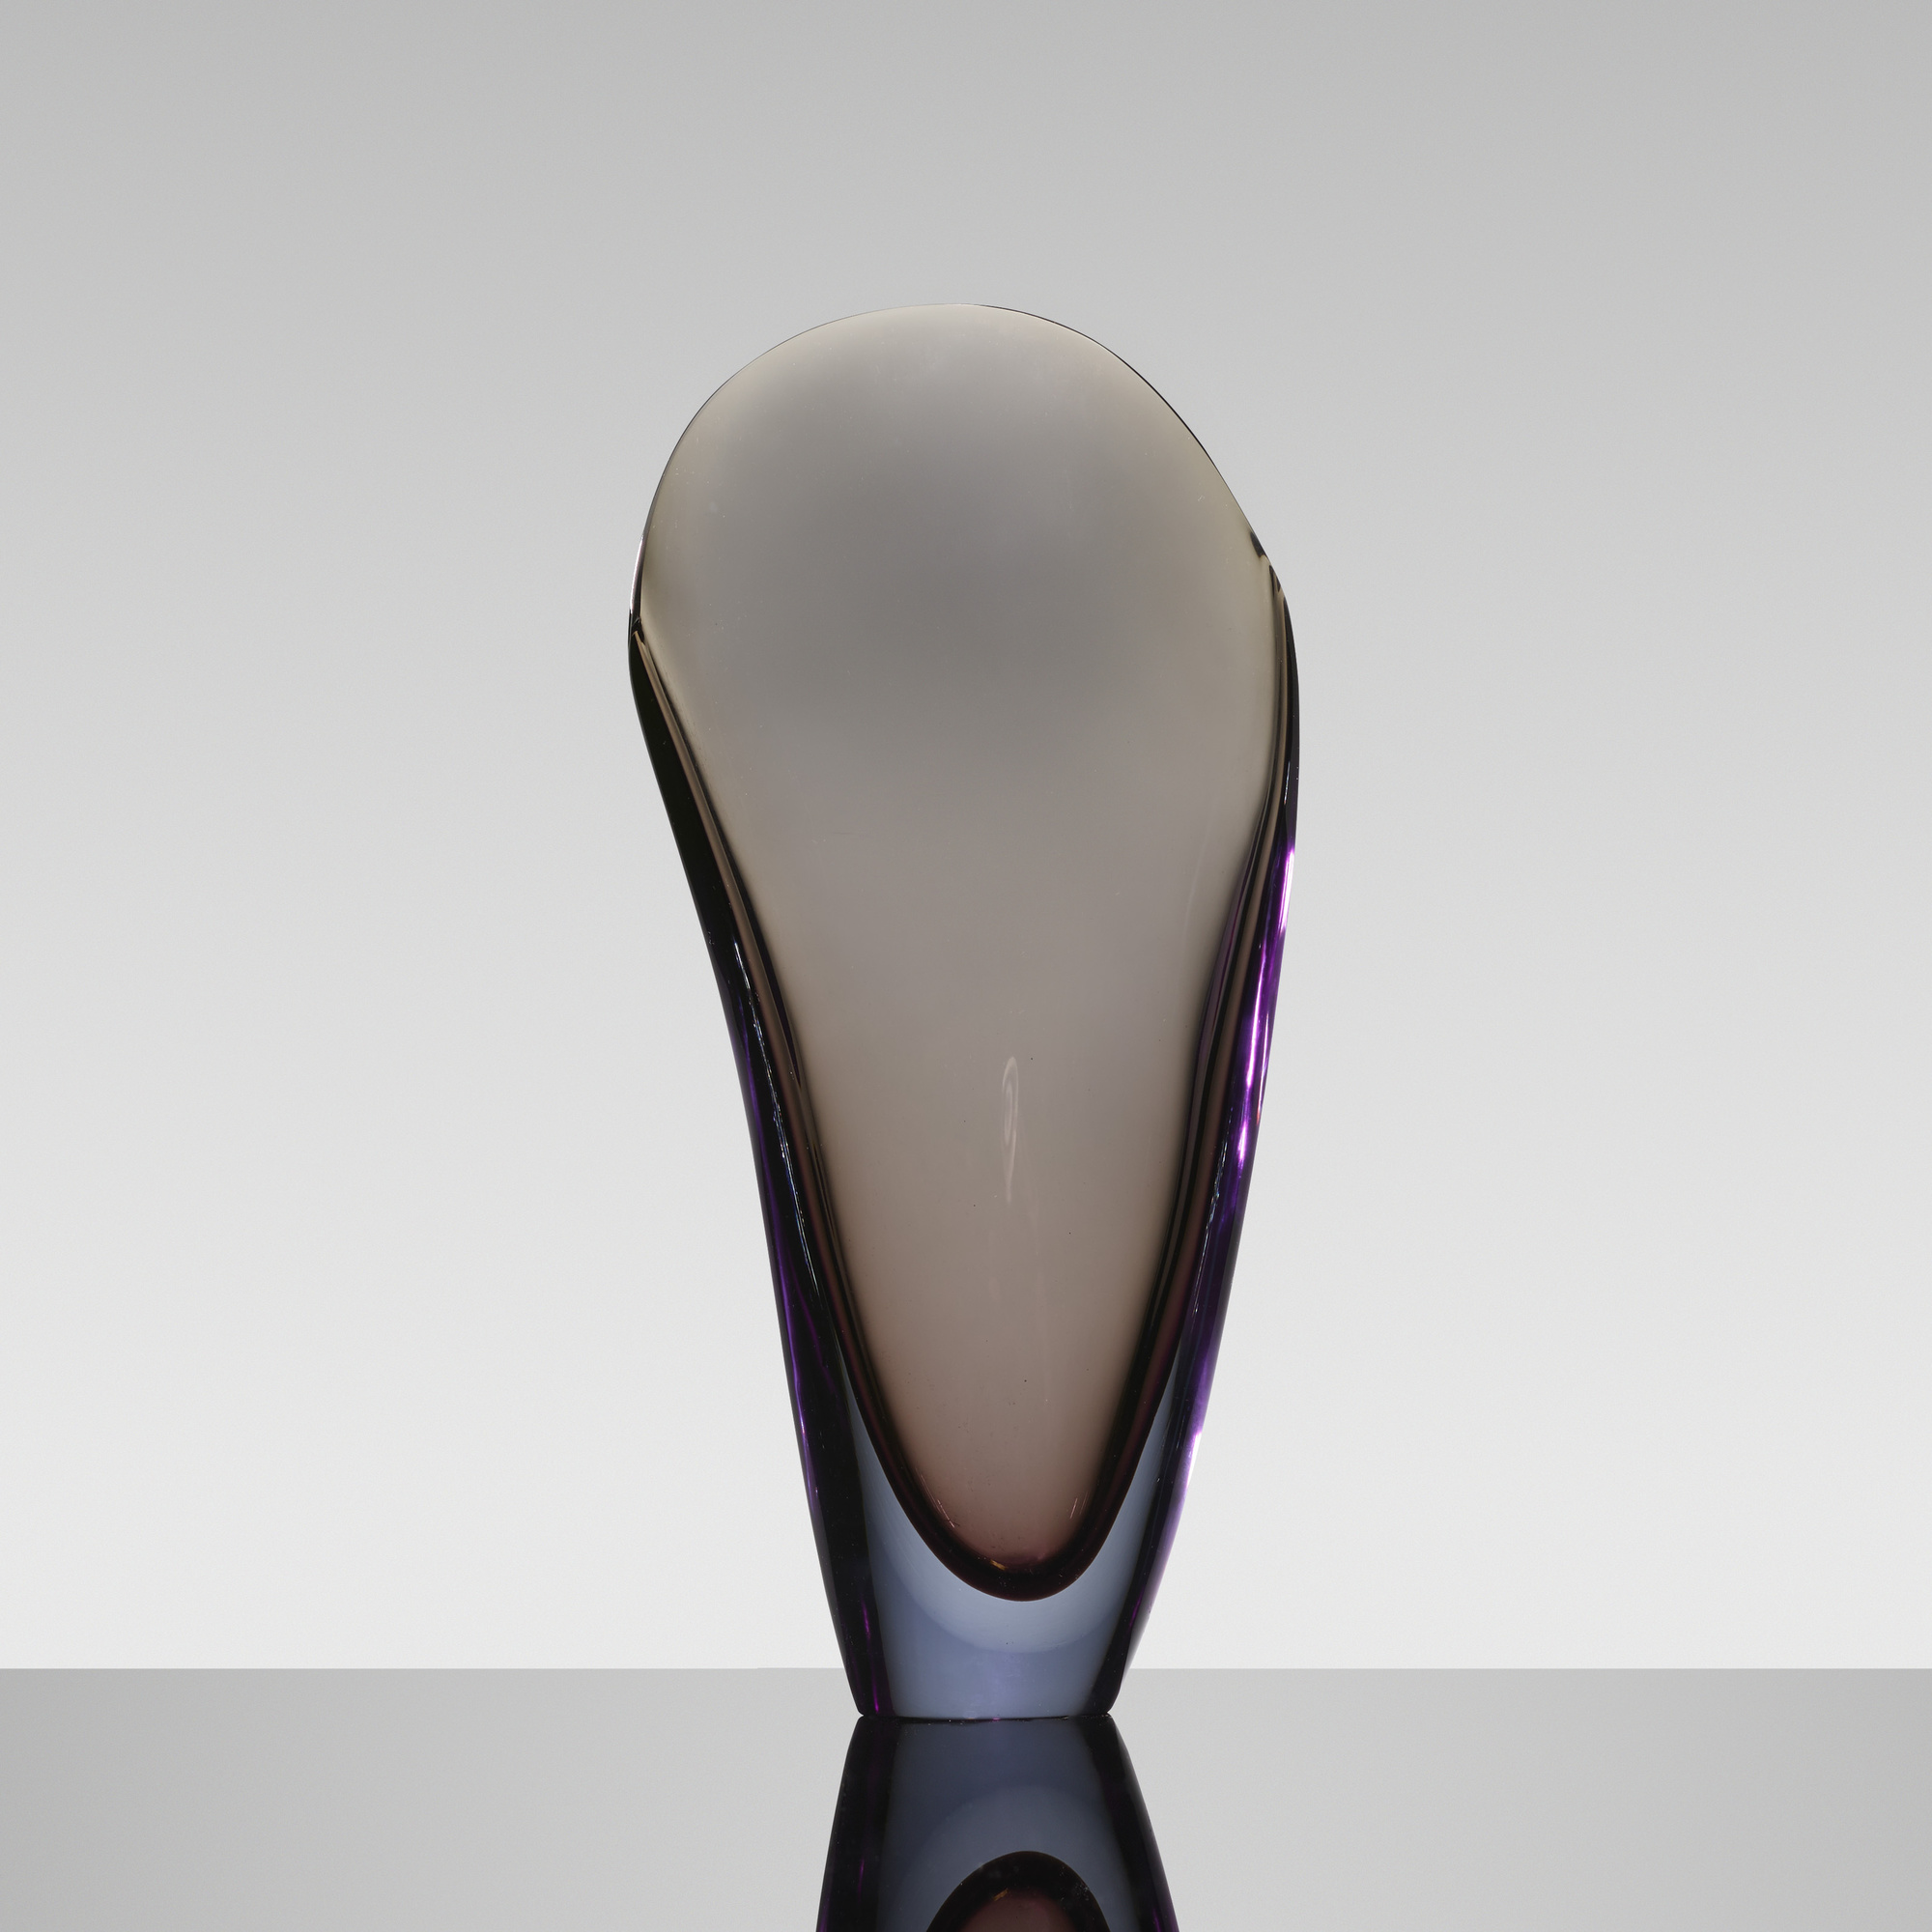 164: Flavio Poli / Valva vase, model 11485 (1 of 2)